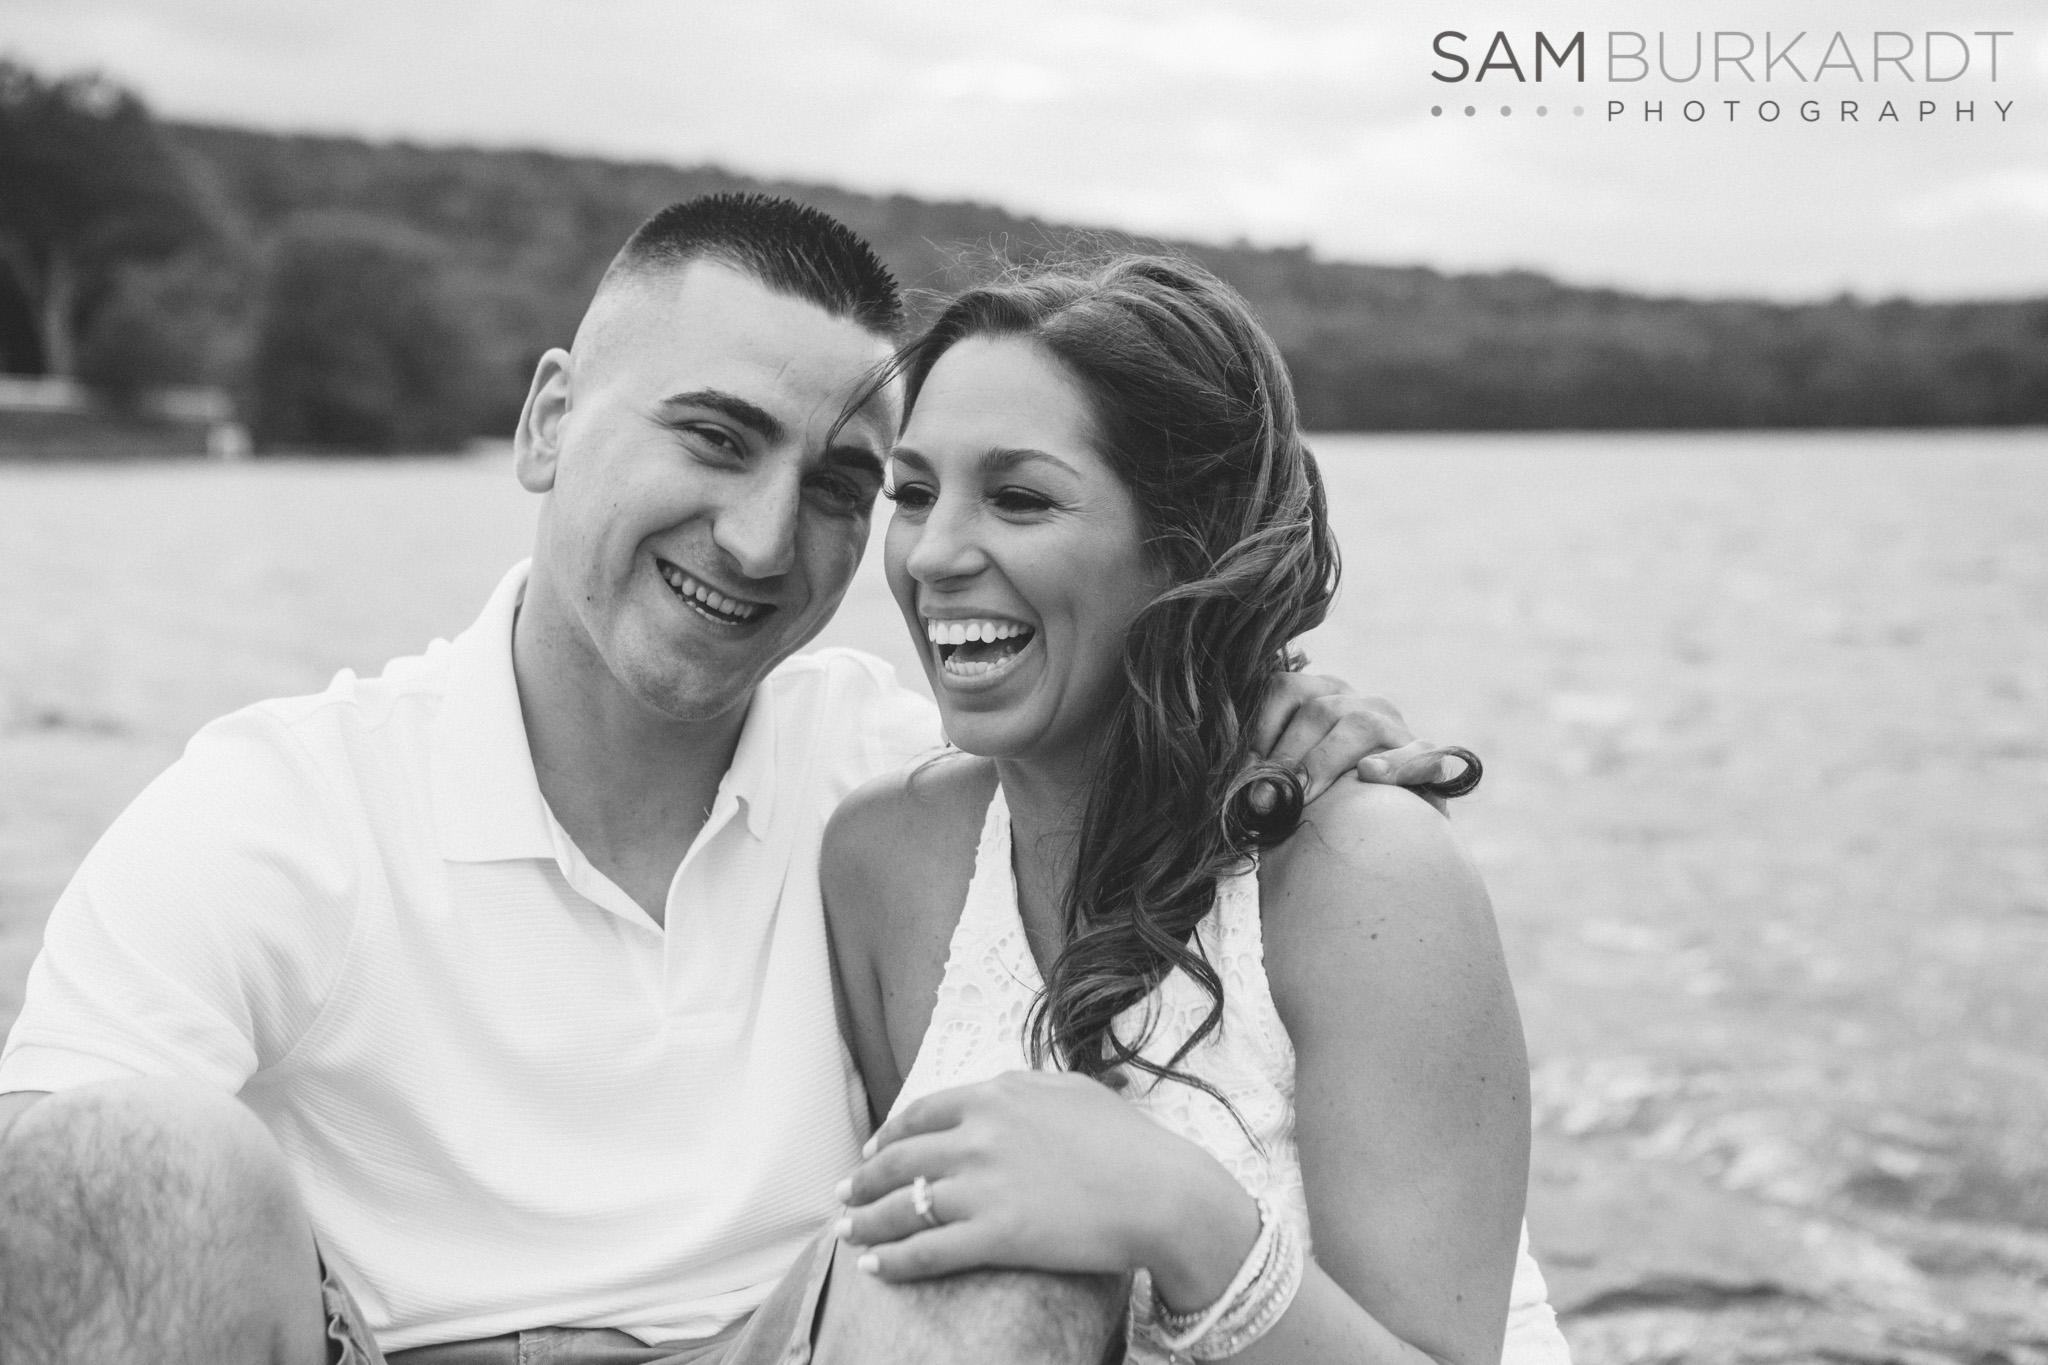 sburkardt_engagement_wedding_candlewood_lake_photography_010.jpg